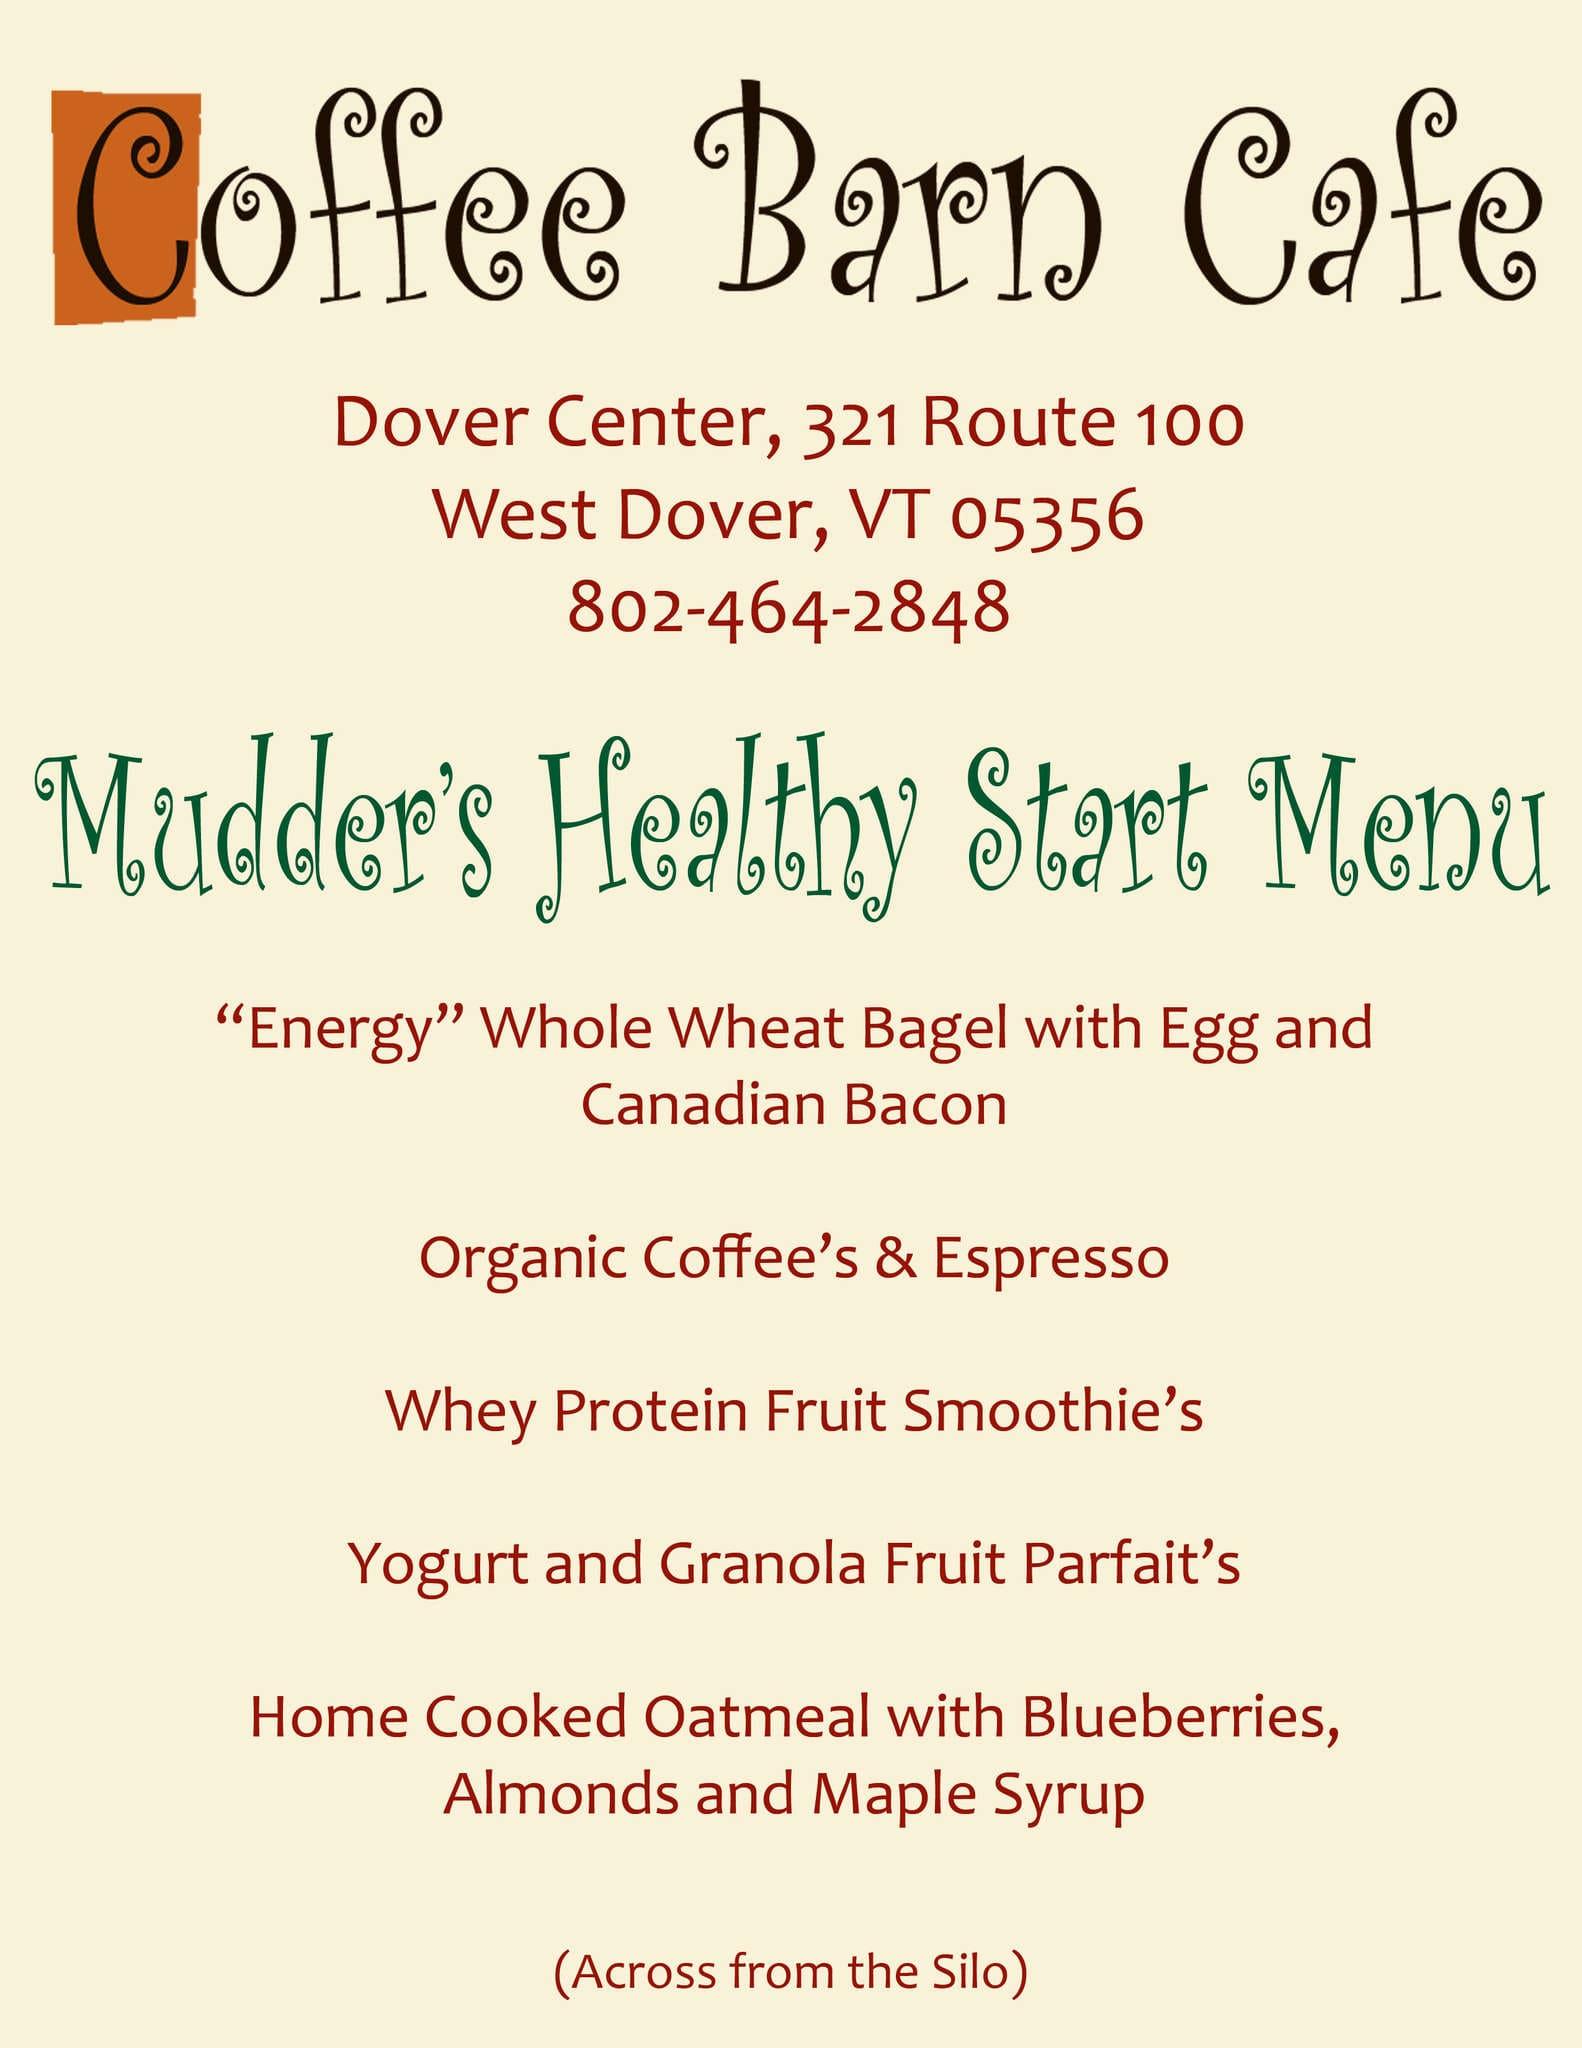 Coffee Barn Cafe Menu Menu For Coffee Barn Cafe Wilmington West